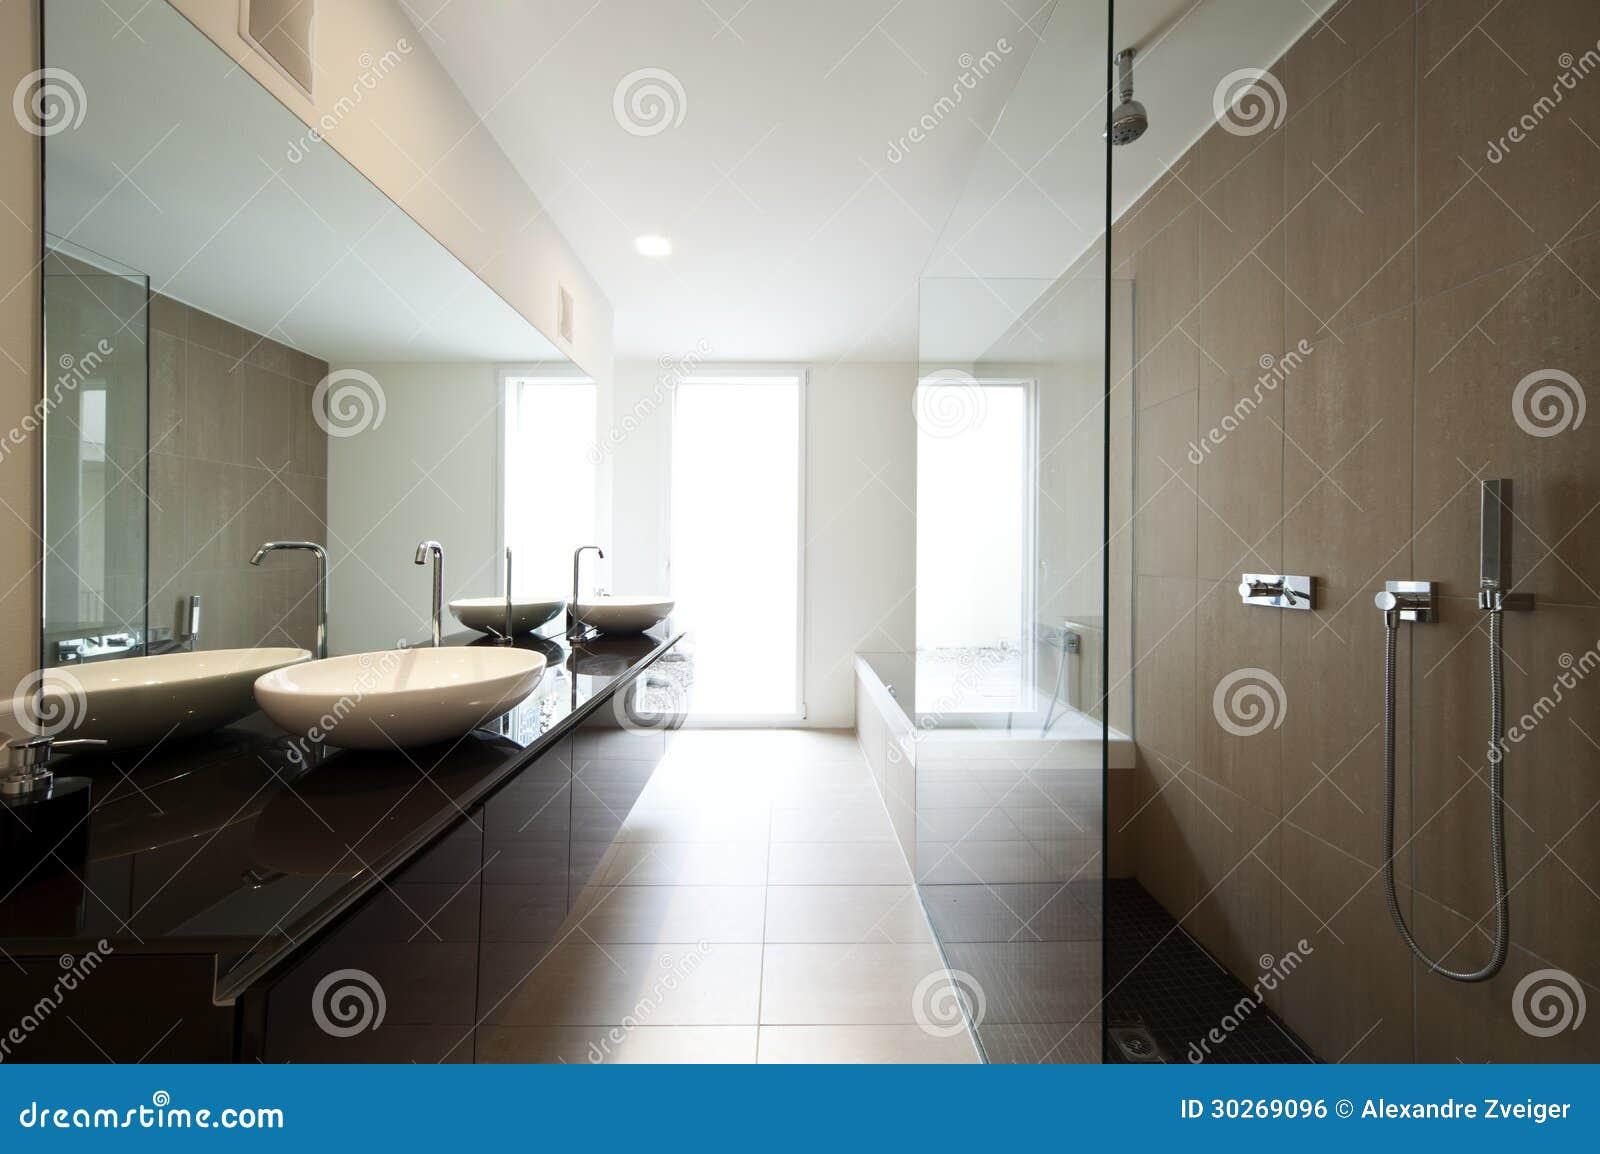 Belle salle de bain minecraft meilleures id es cr atives for Une belle salle de bain